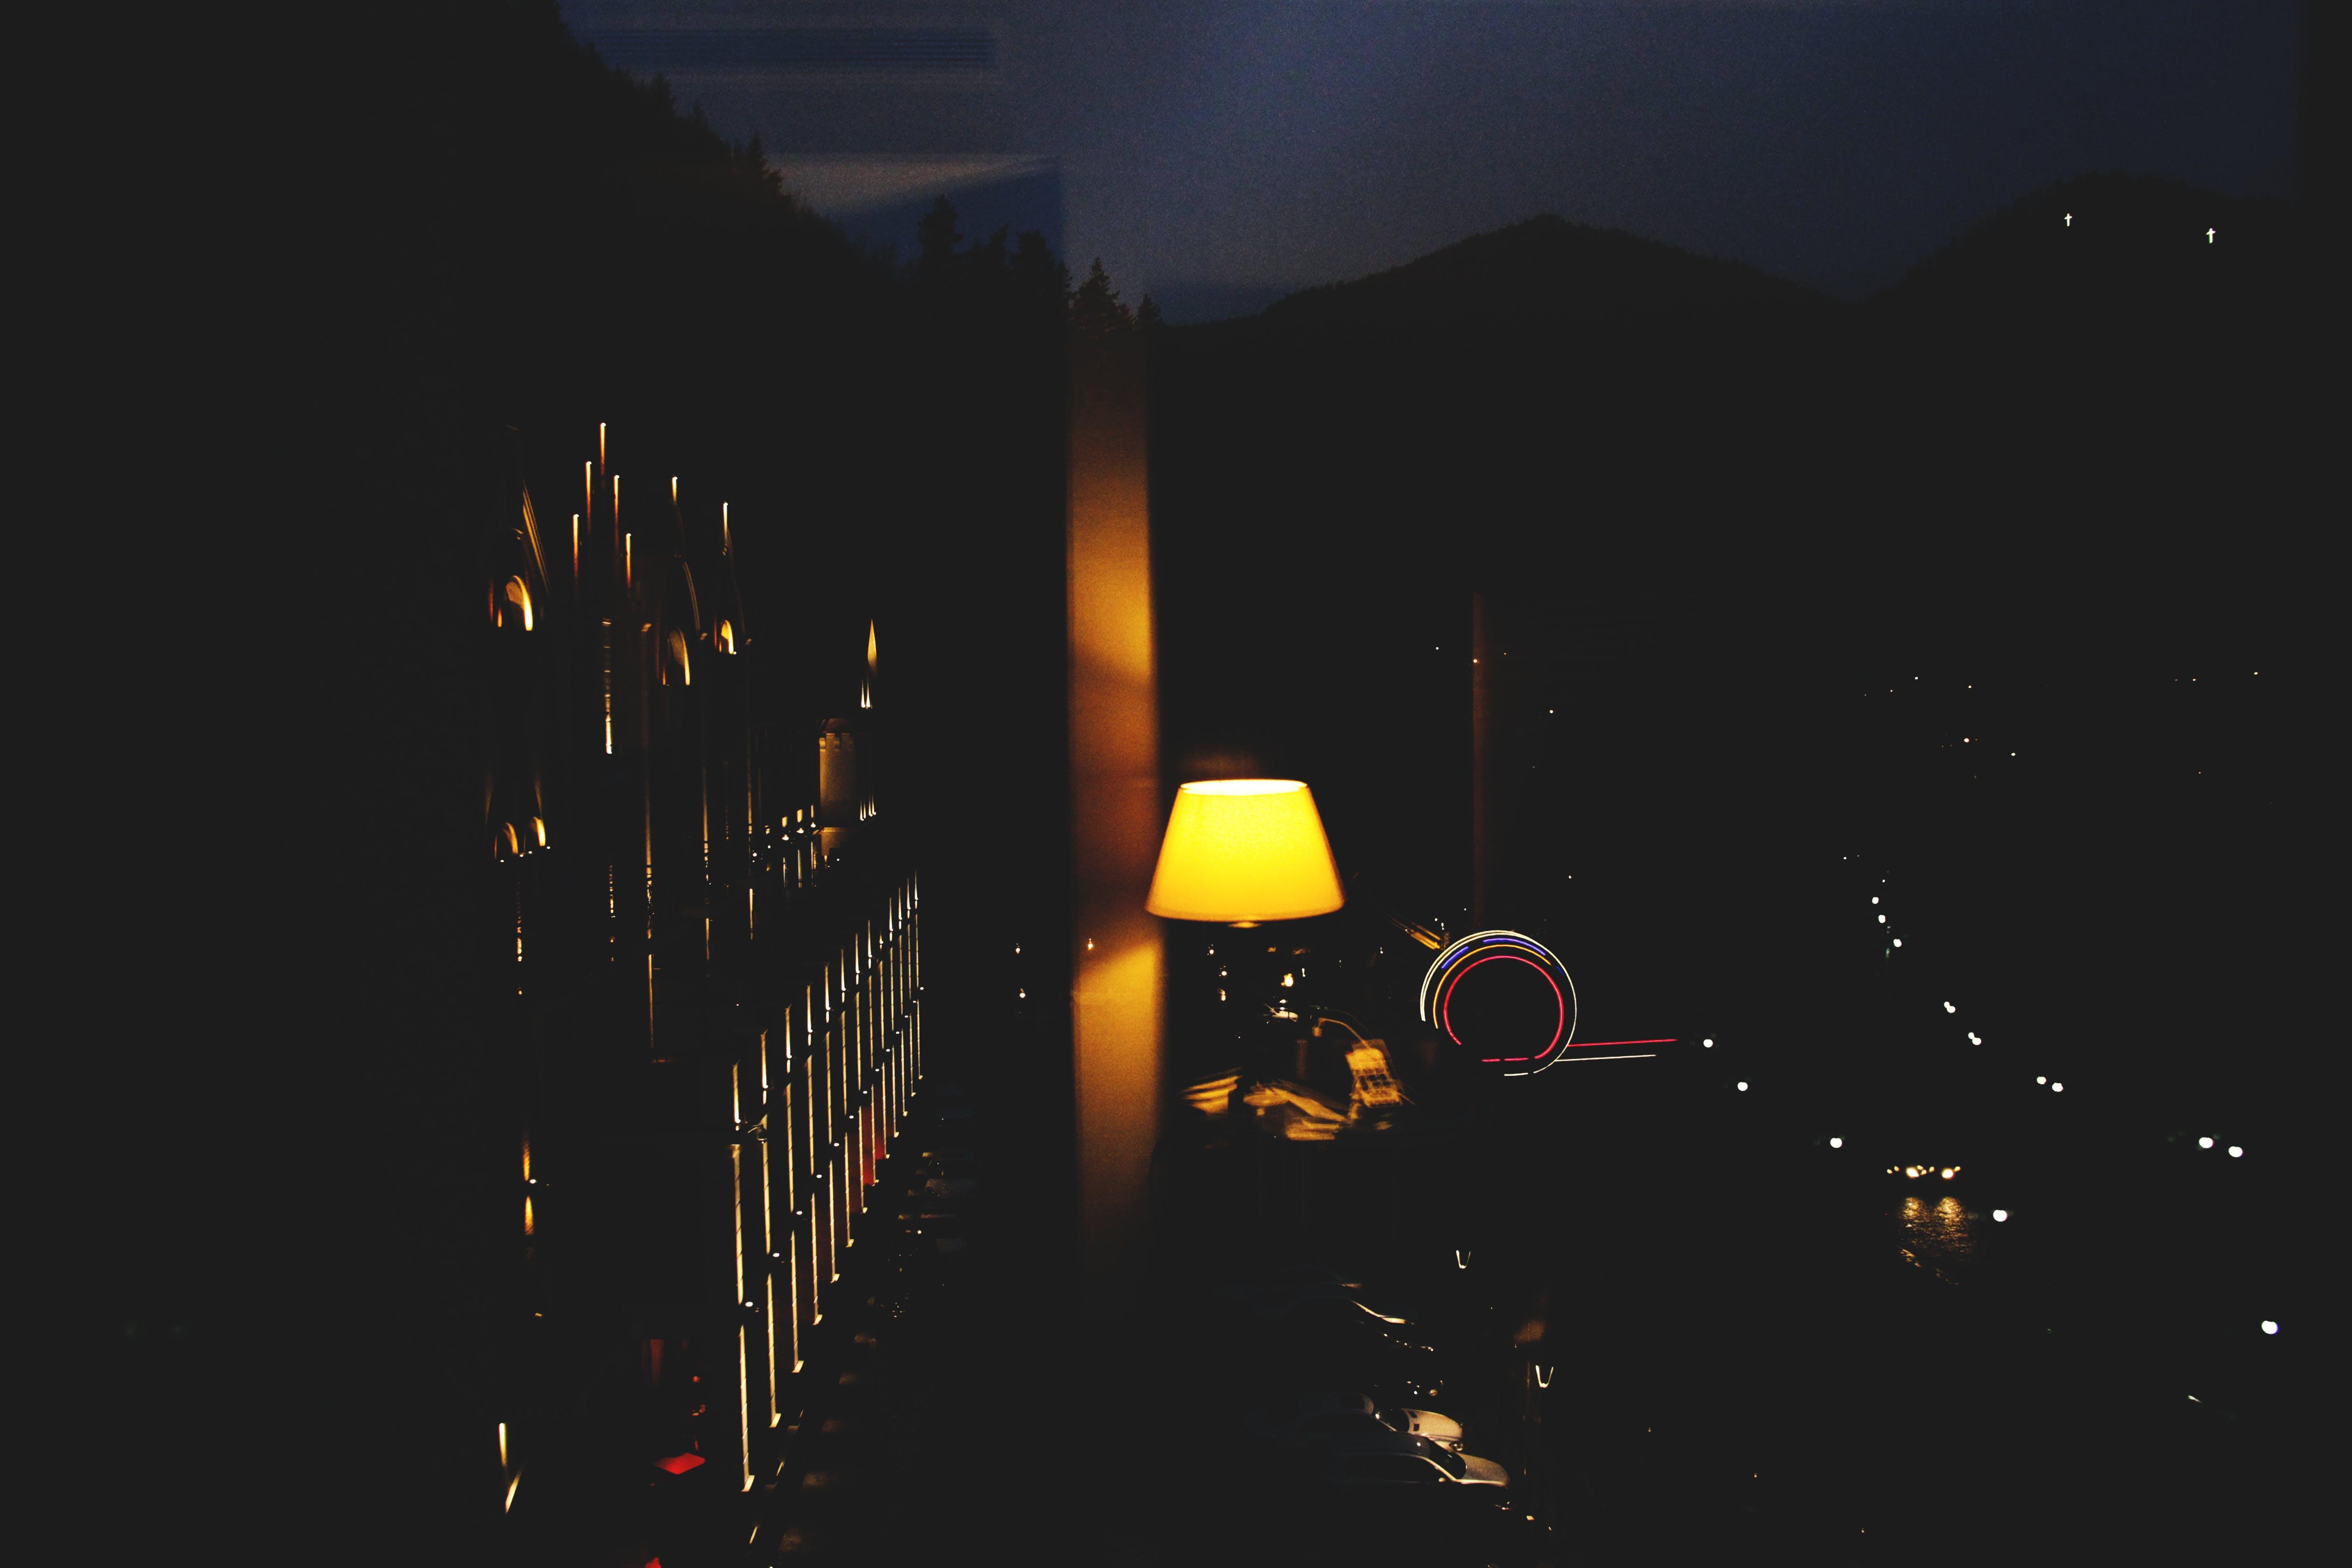 Turned on Lamp in Dark Room